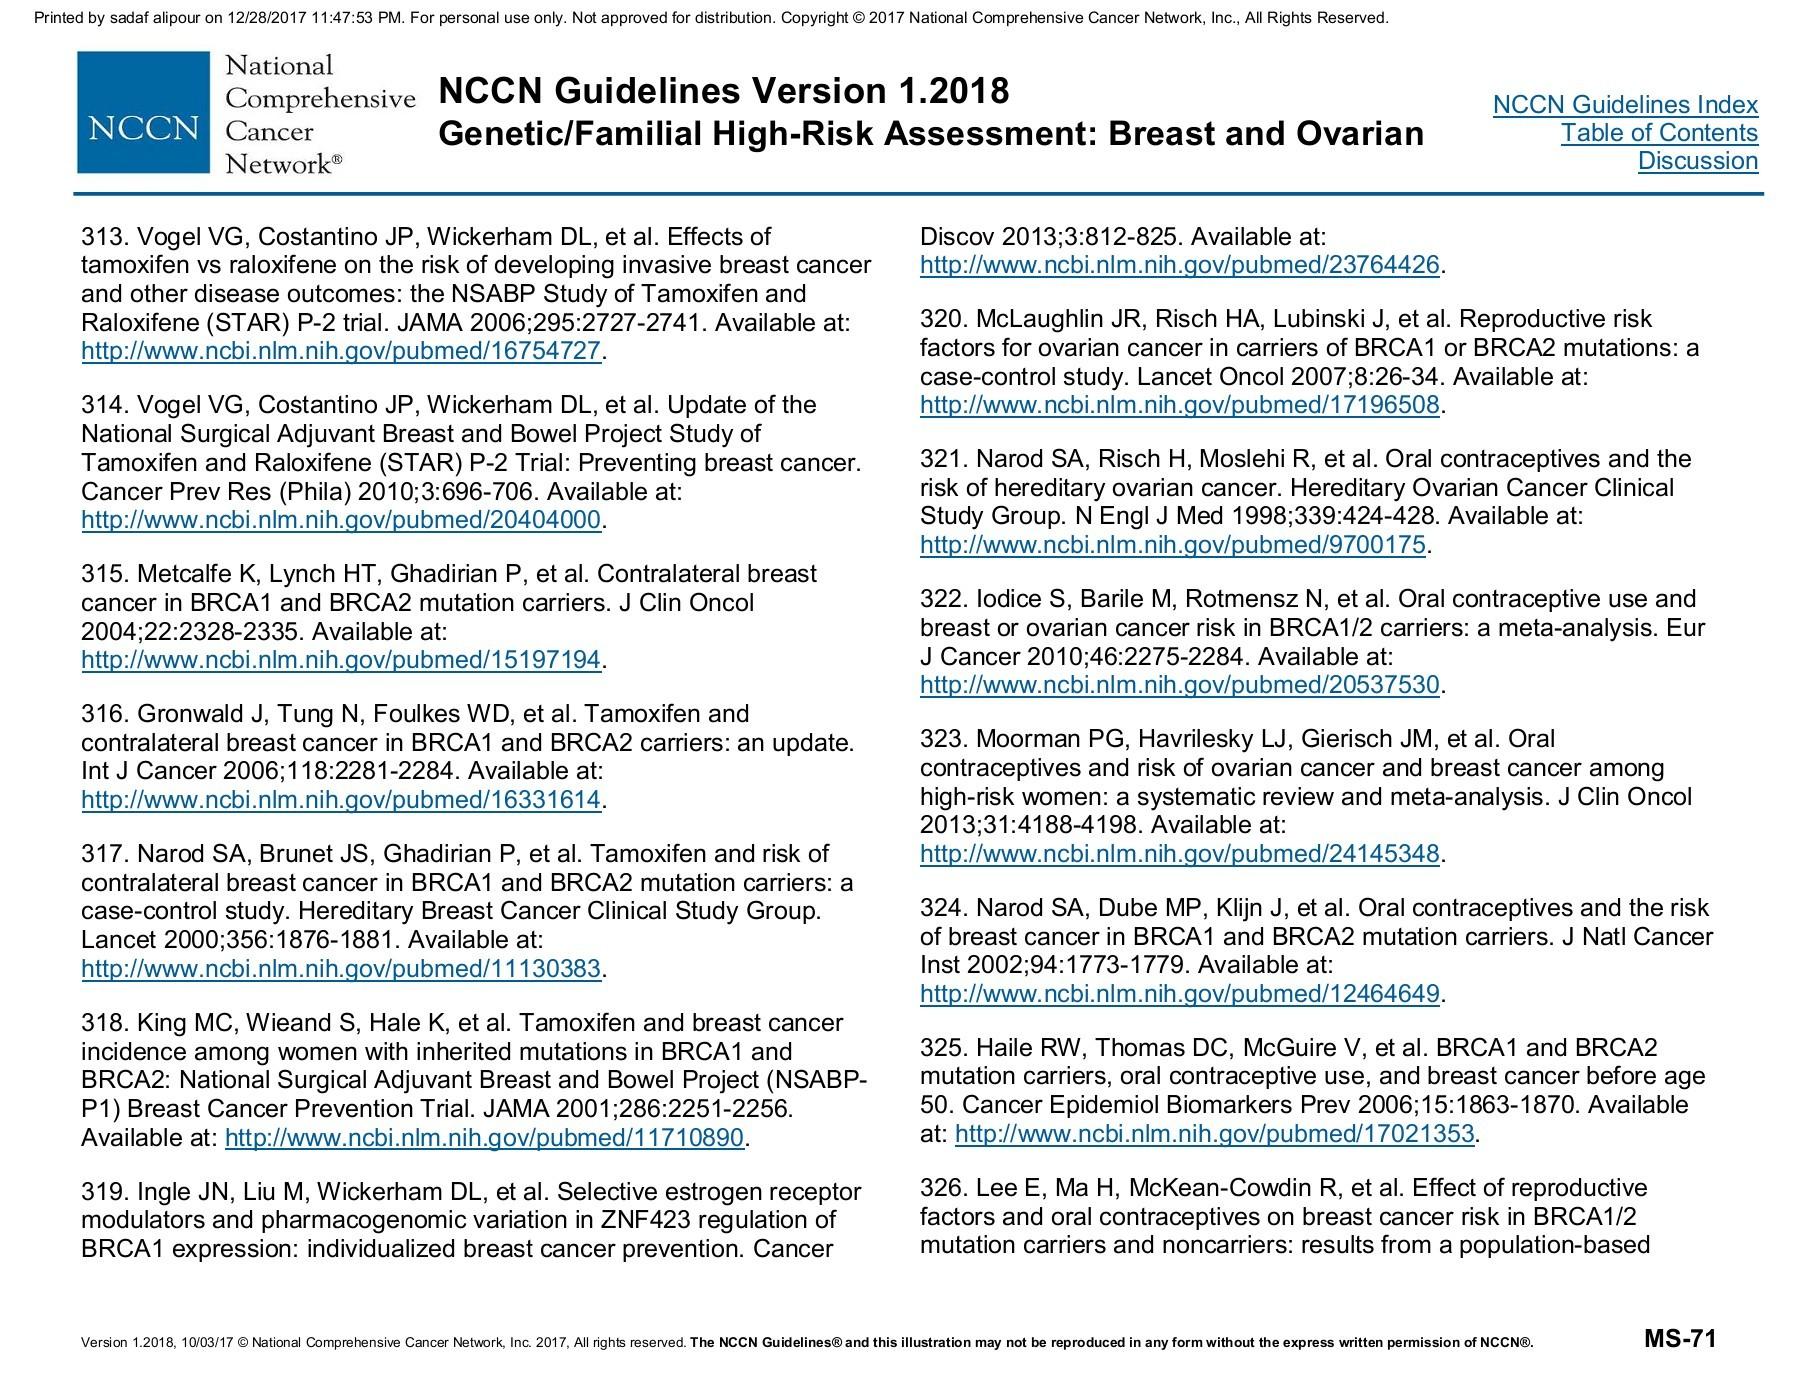 Nccn Bc Oc Risk Assessment Flip Book Pages 101 110 Pubhtml5